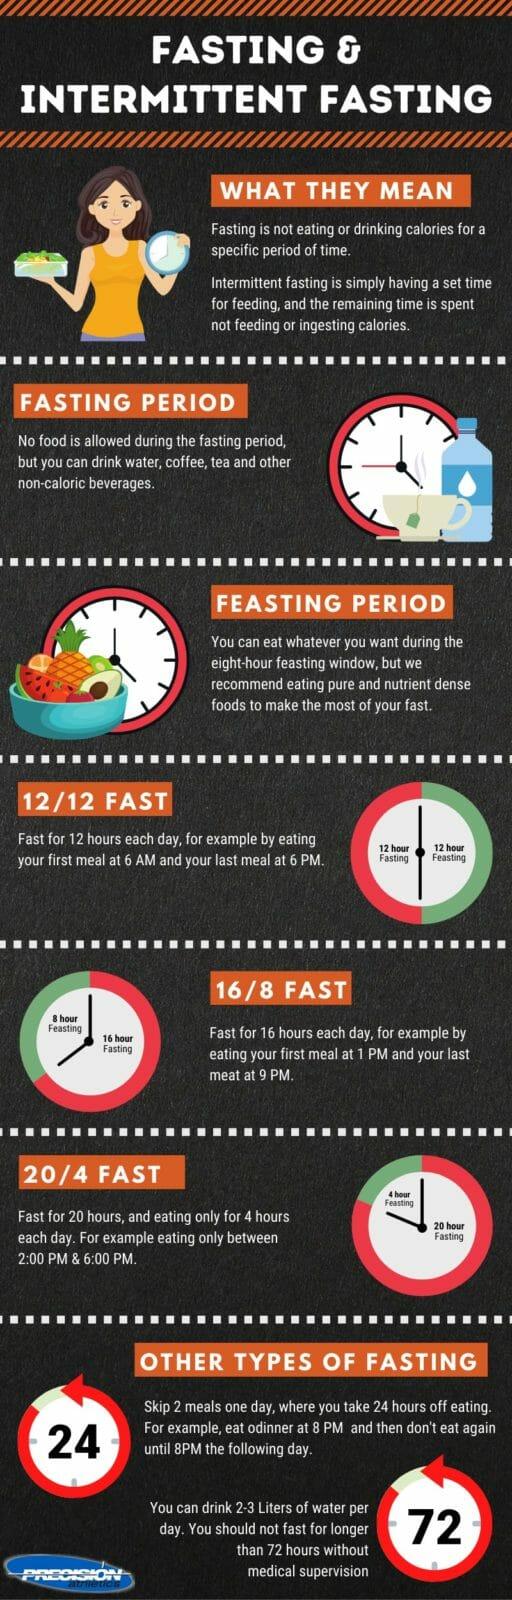 Intermittent fasting Ties